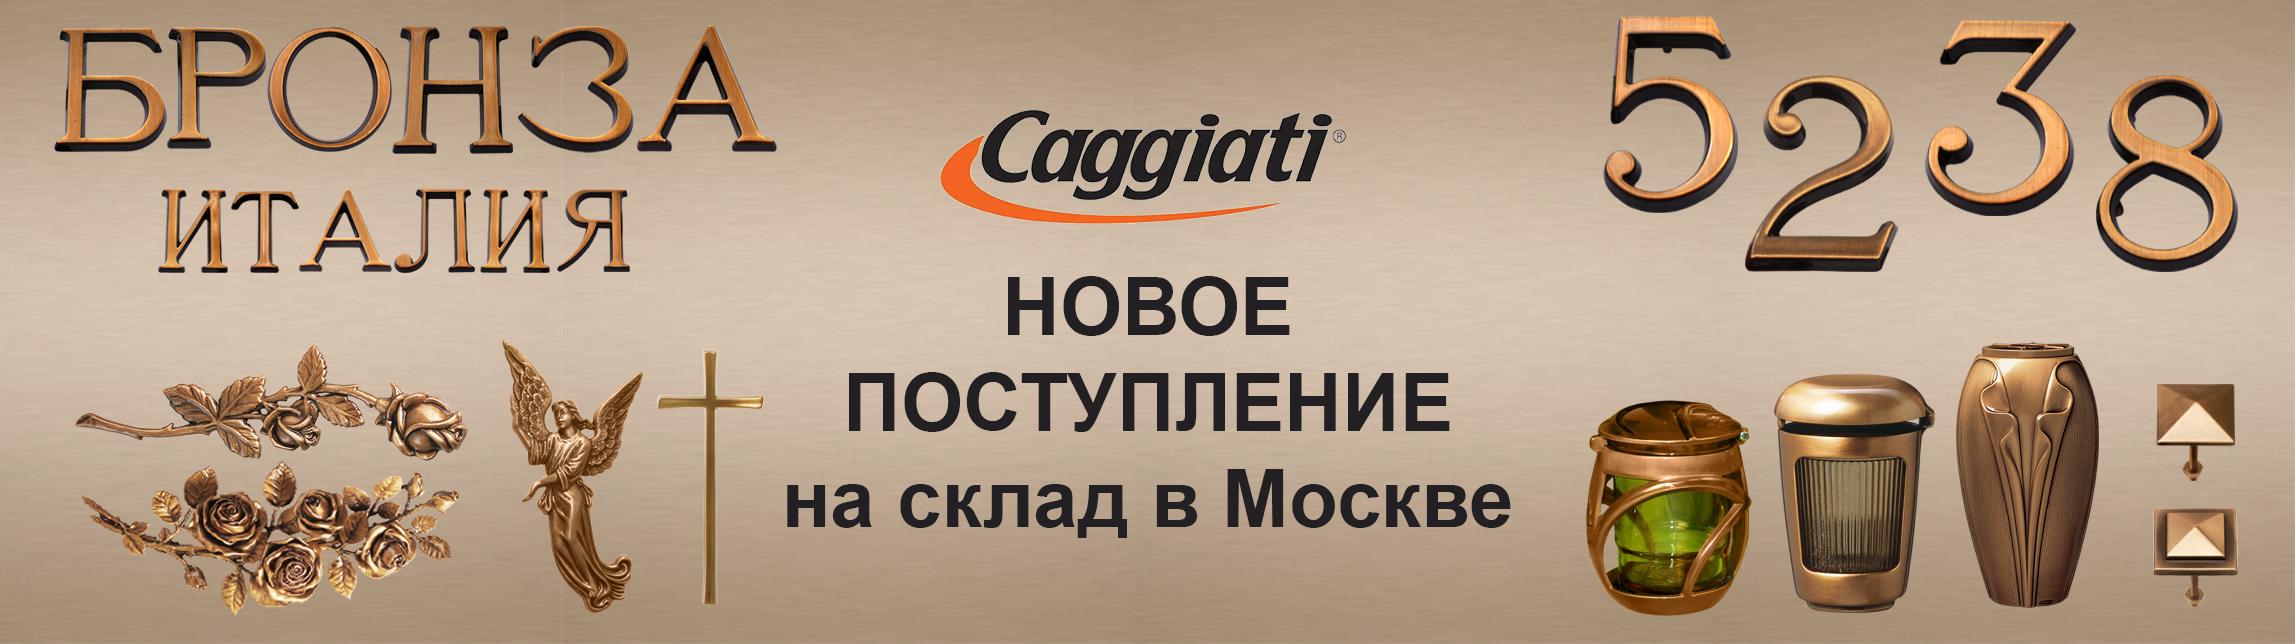 Алмир представляет Каджиатти